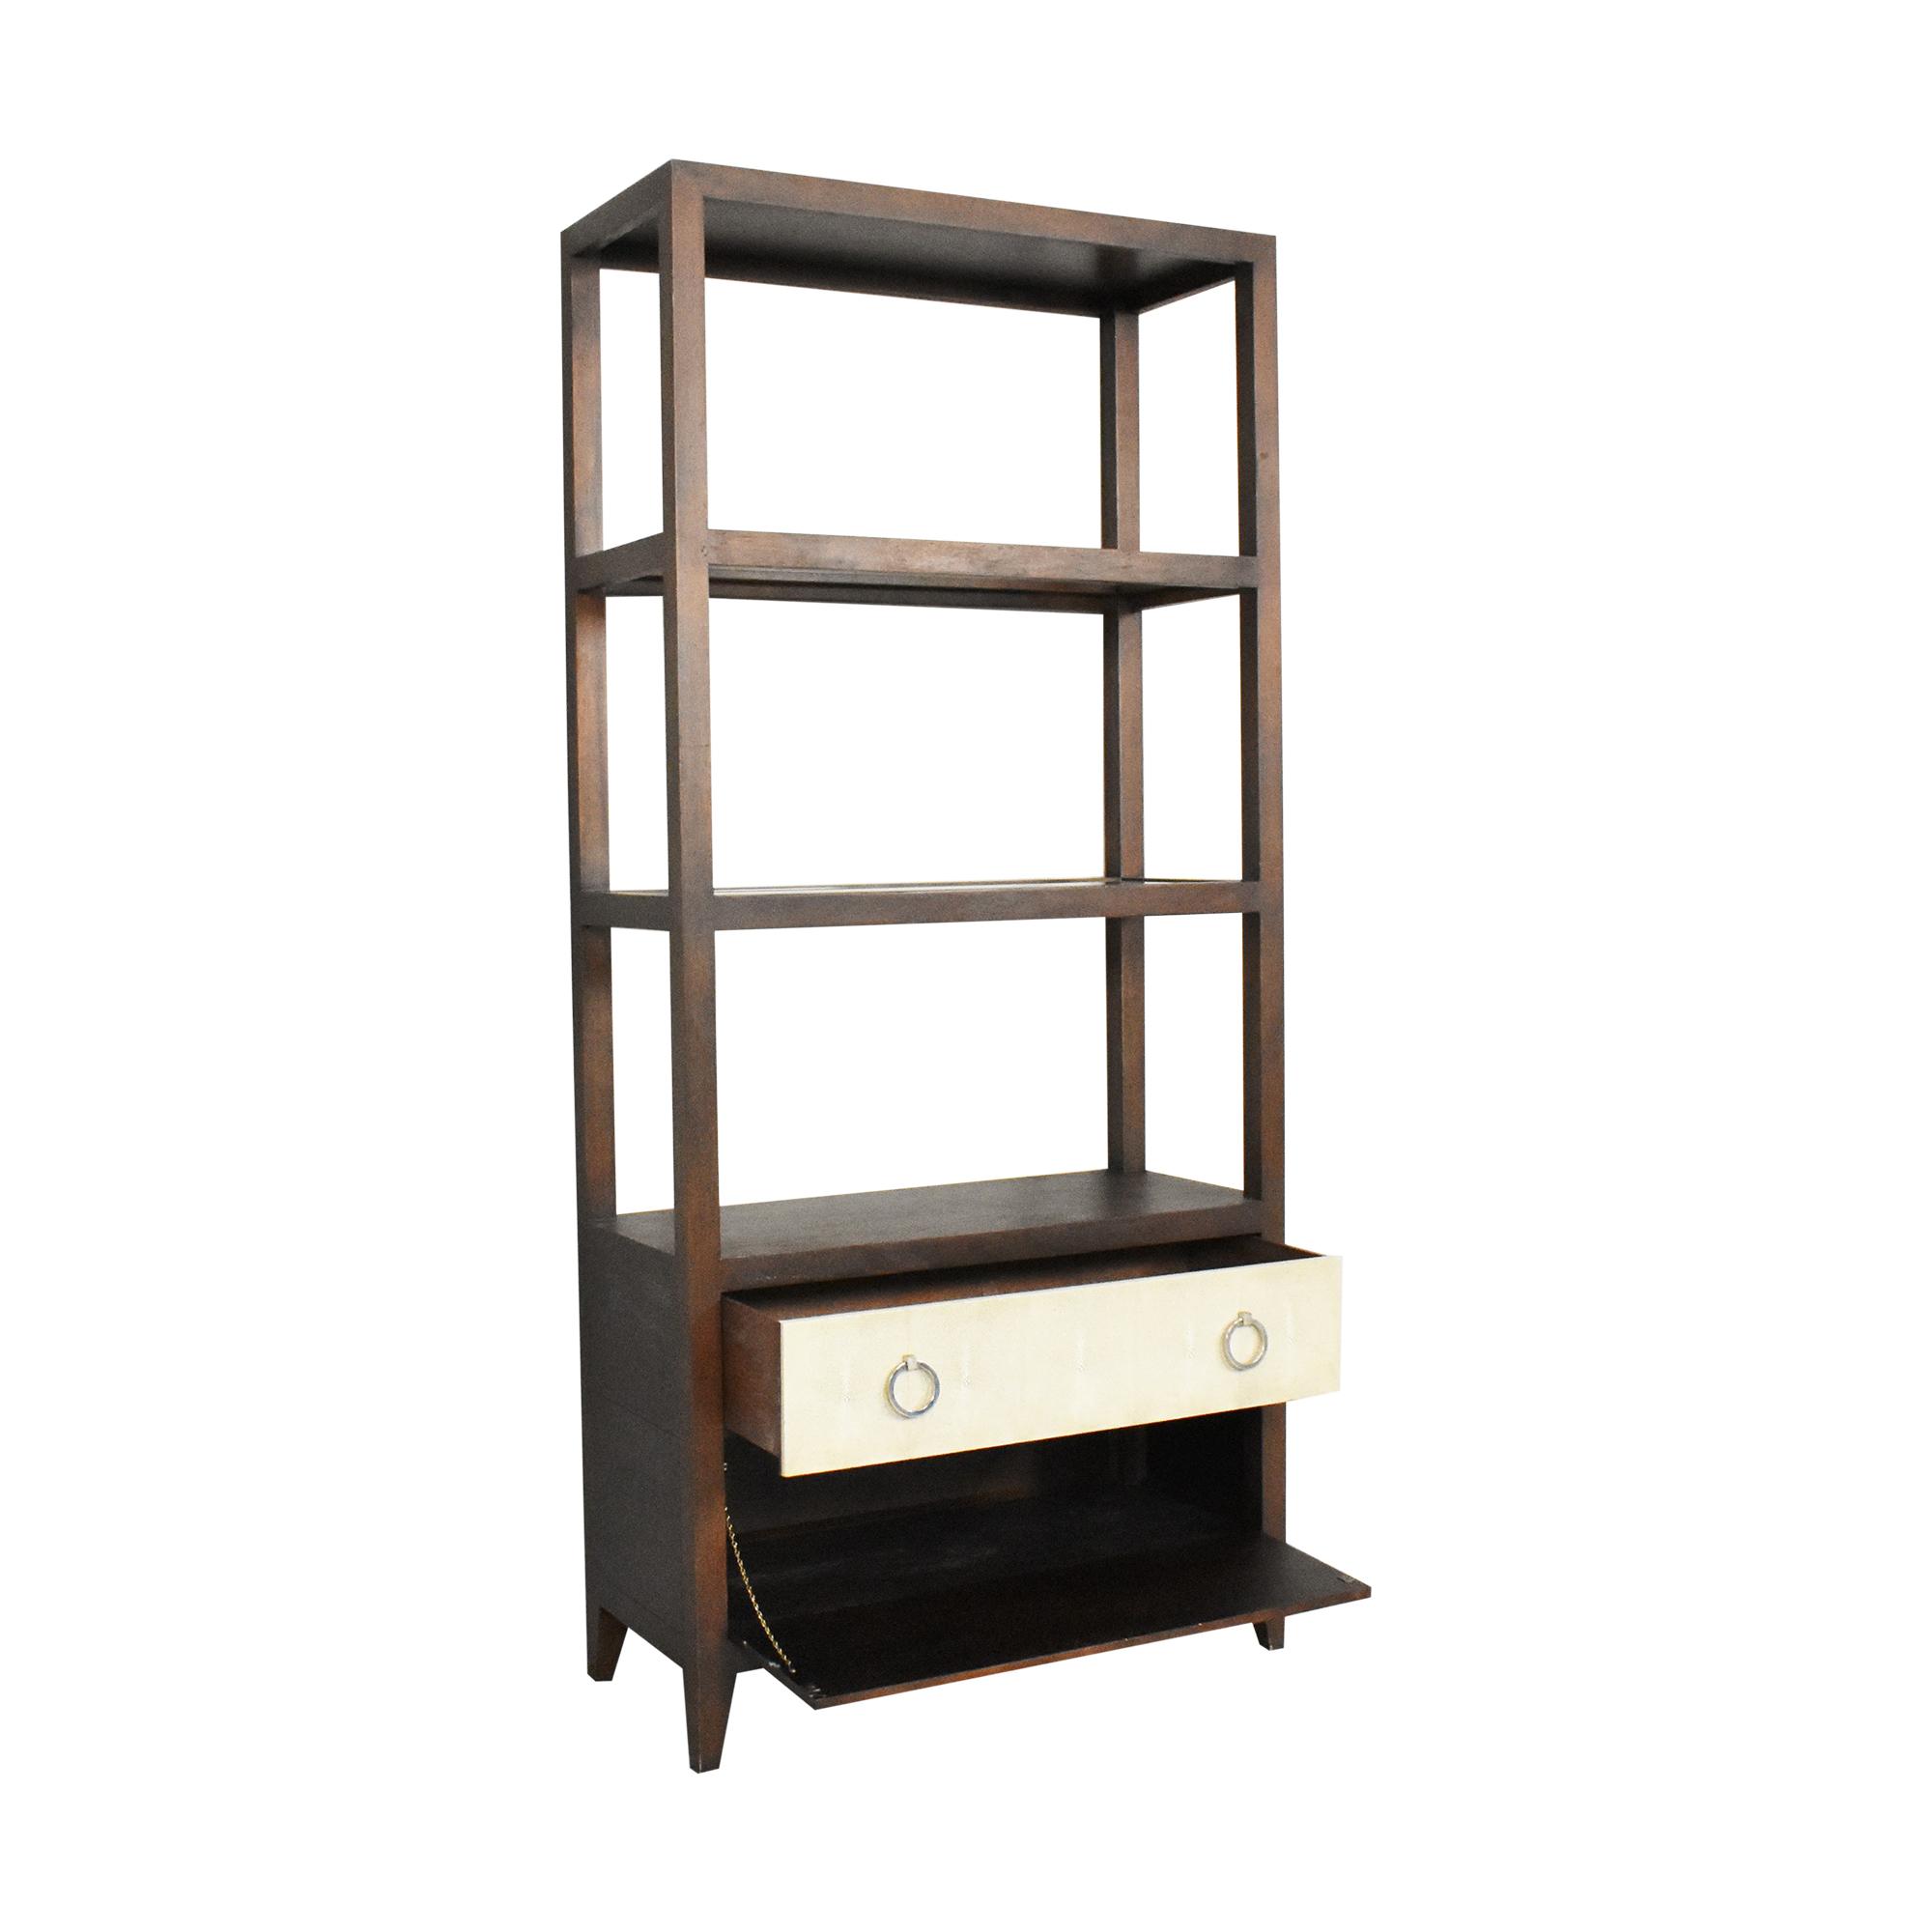 Hickory White for Lillian August Breuer Etagere / Bookcases & Shelving